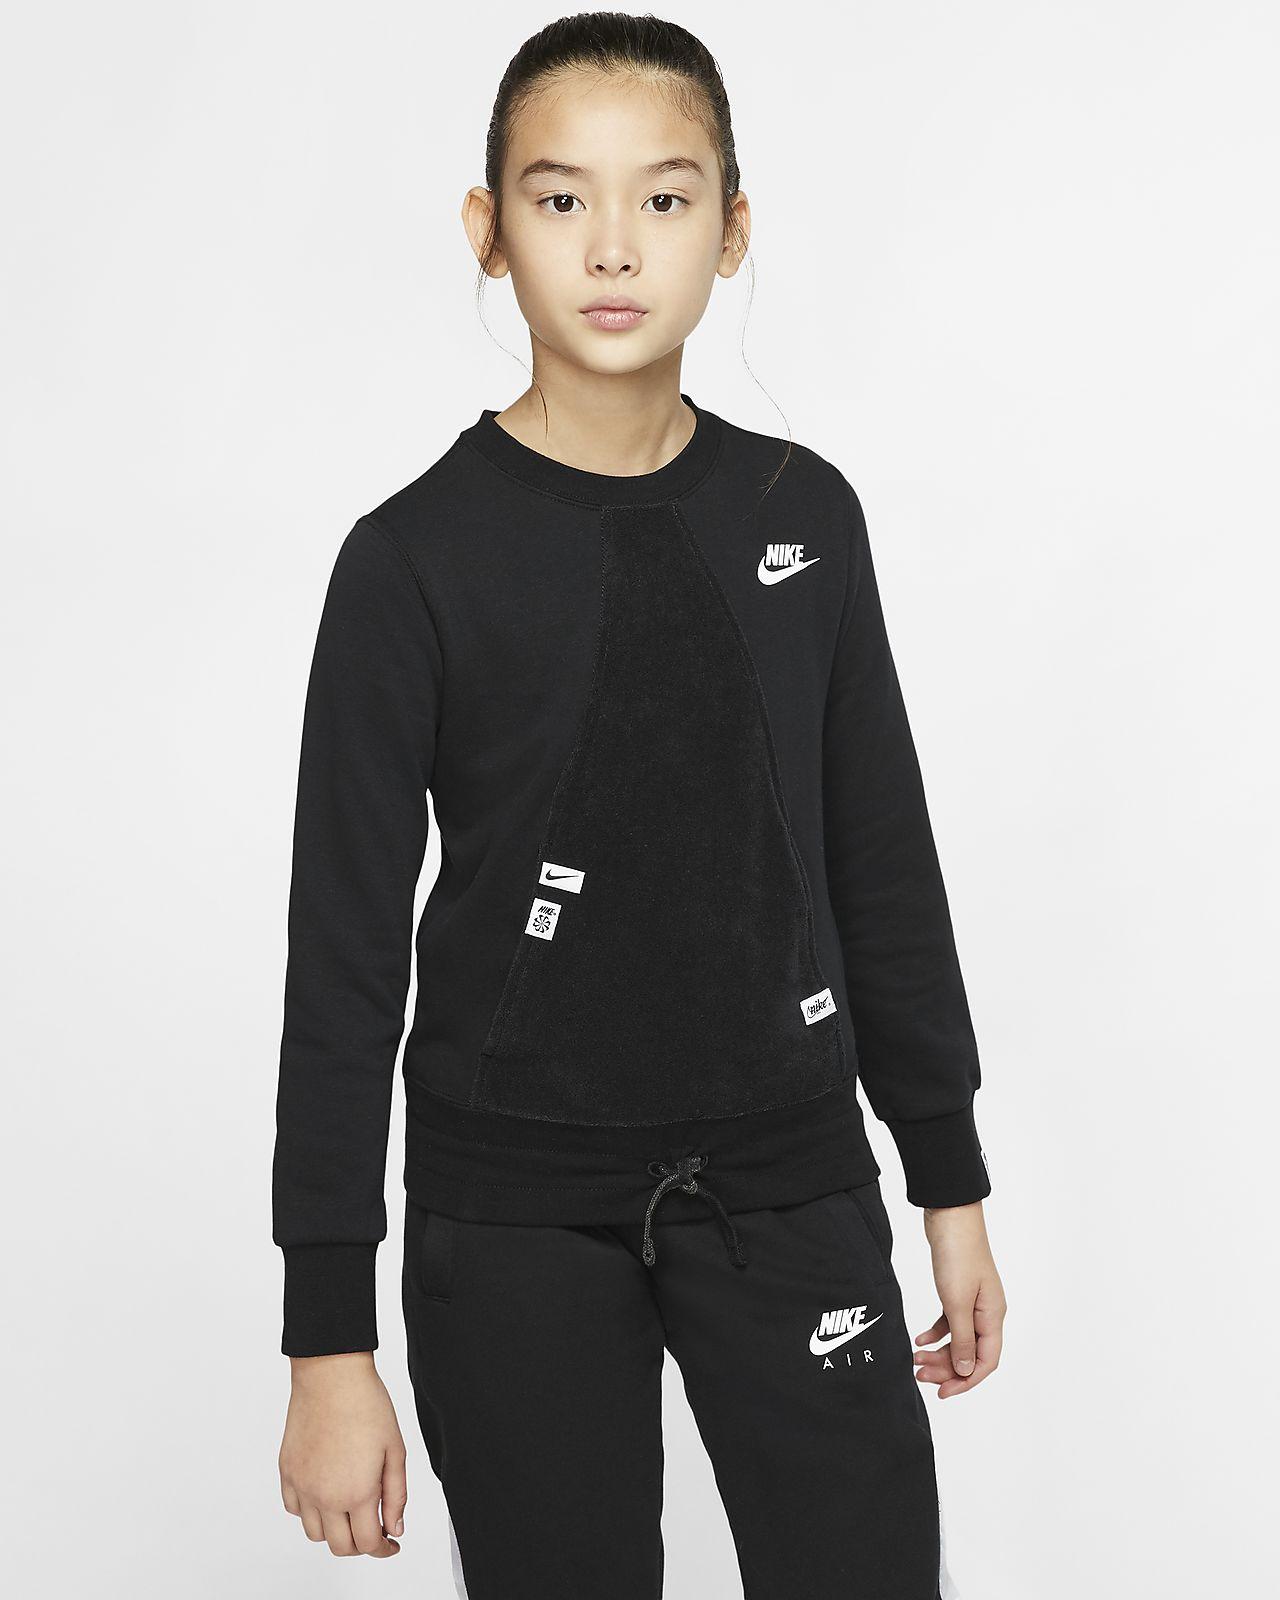 Nike Sportswear Heritage Older Kids' (Girls') Long-Sleeve Top